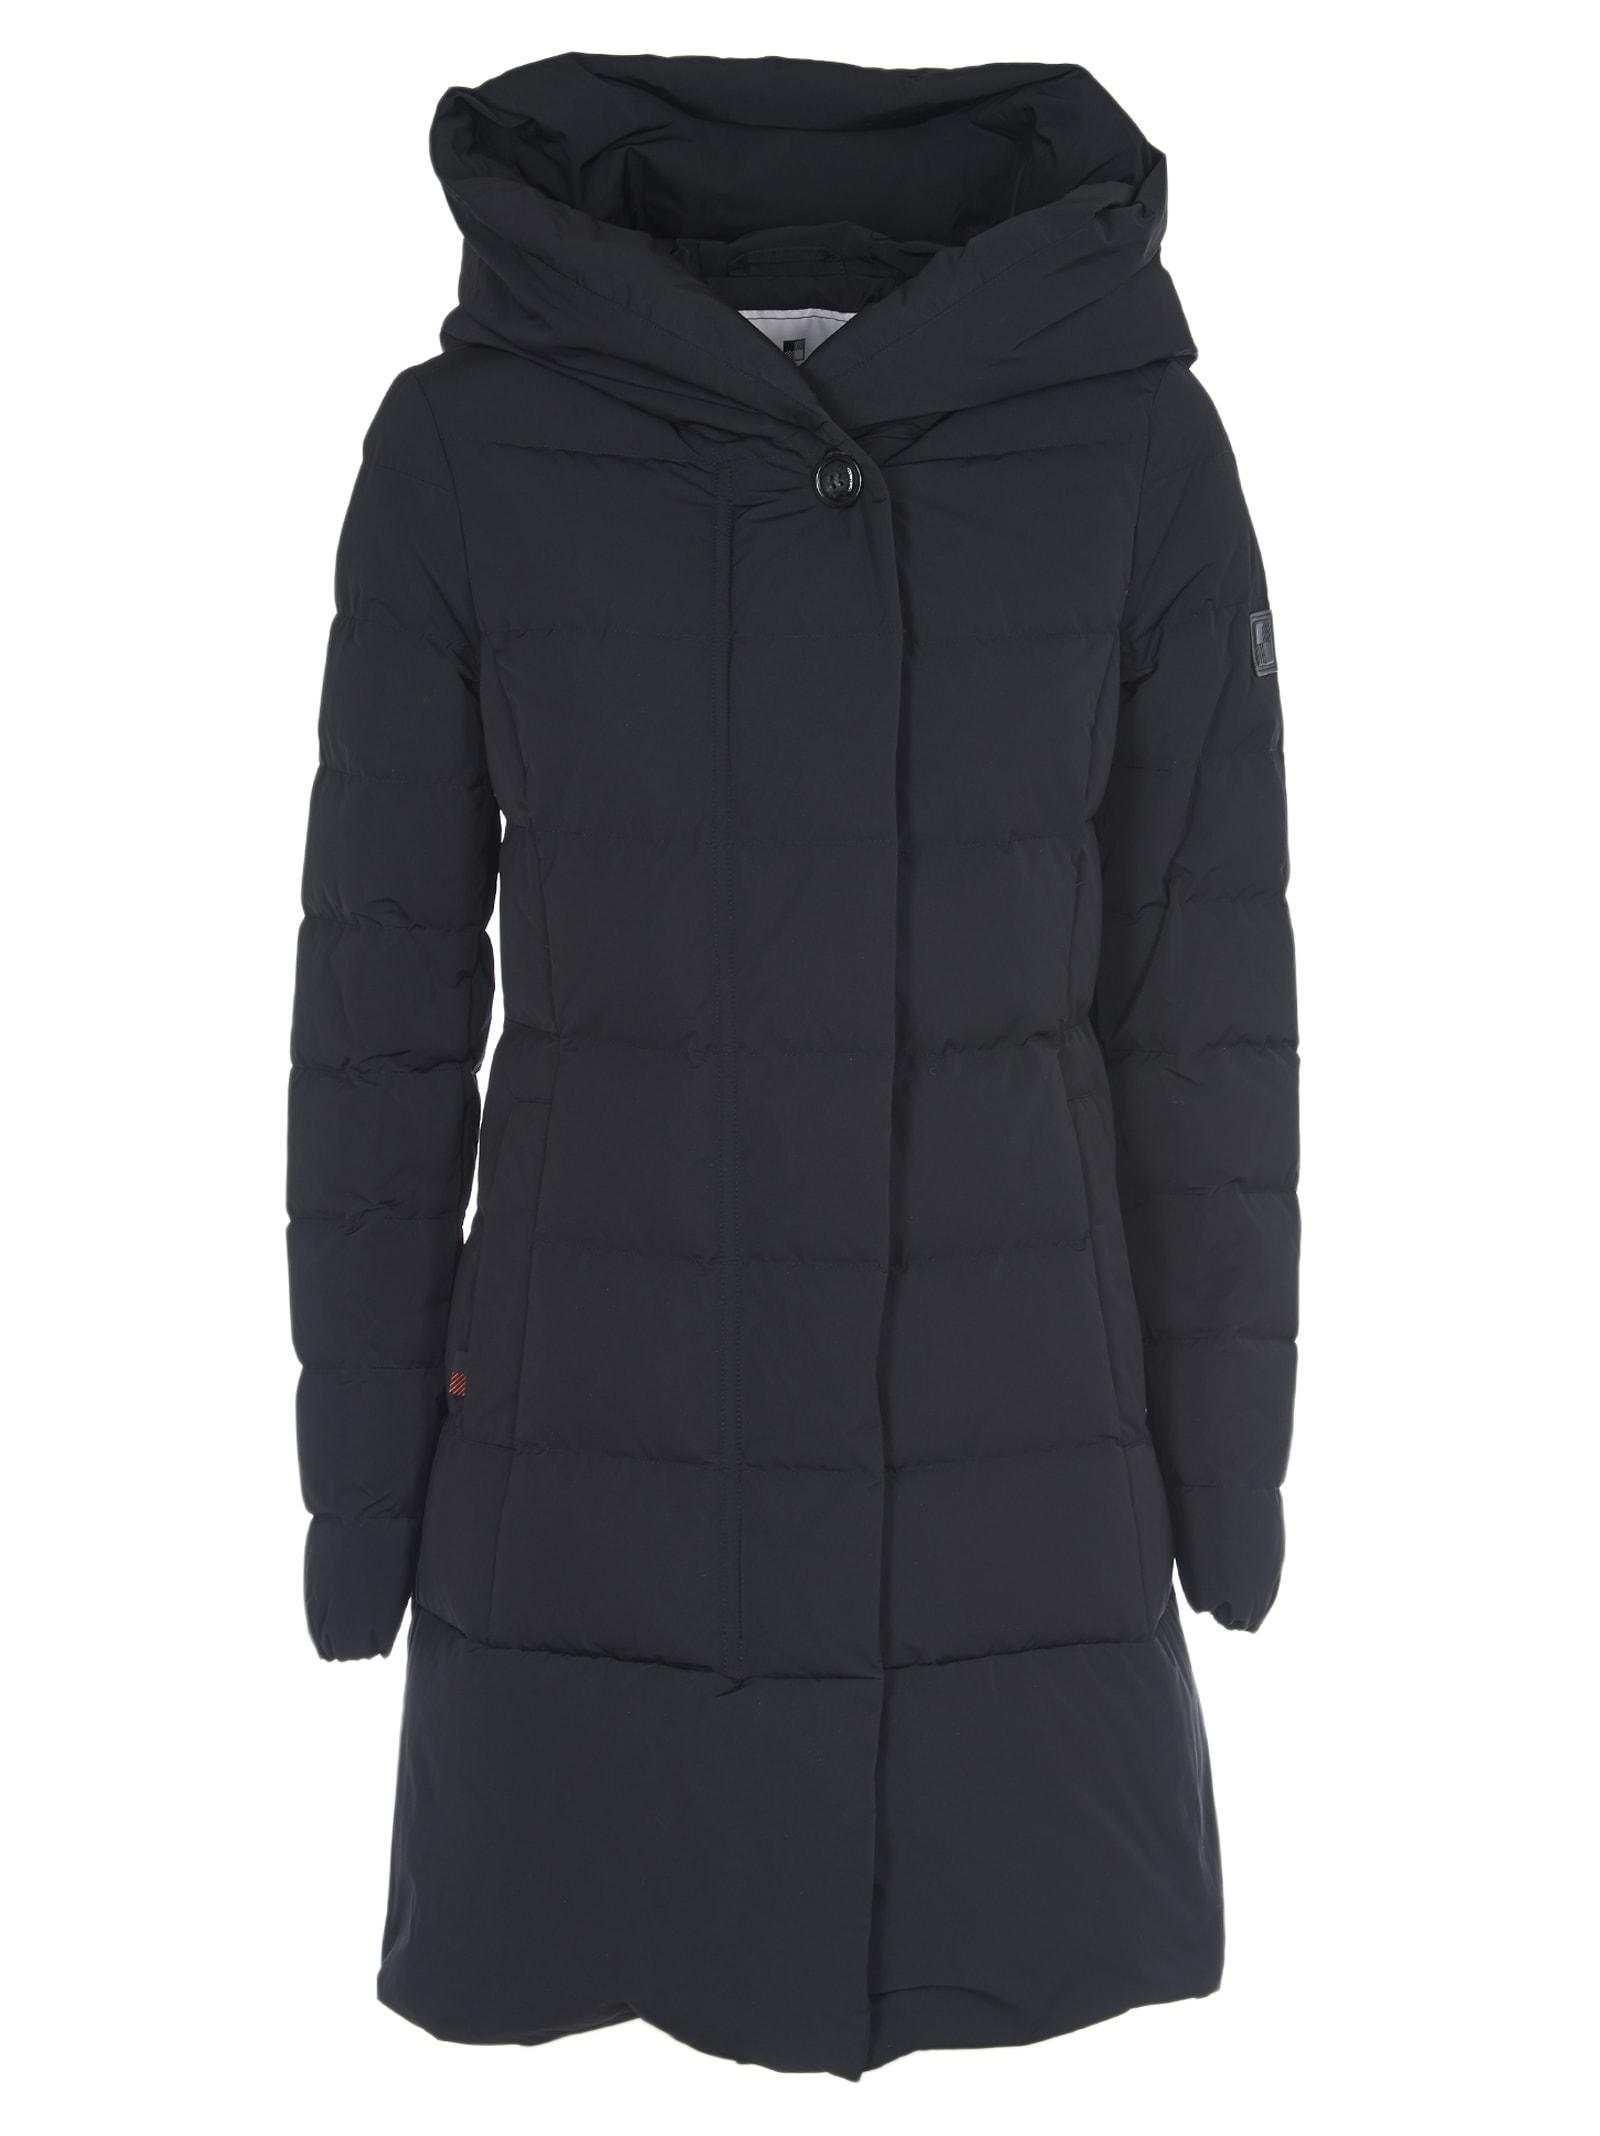 Woolrich Black Puffy Prescot Parka